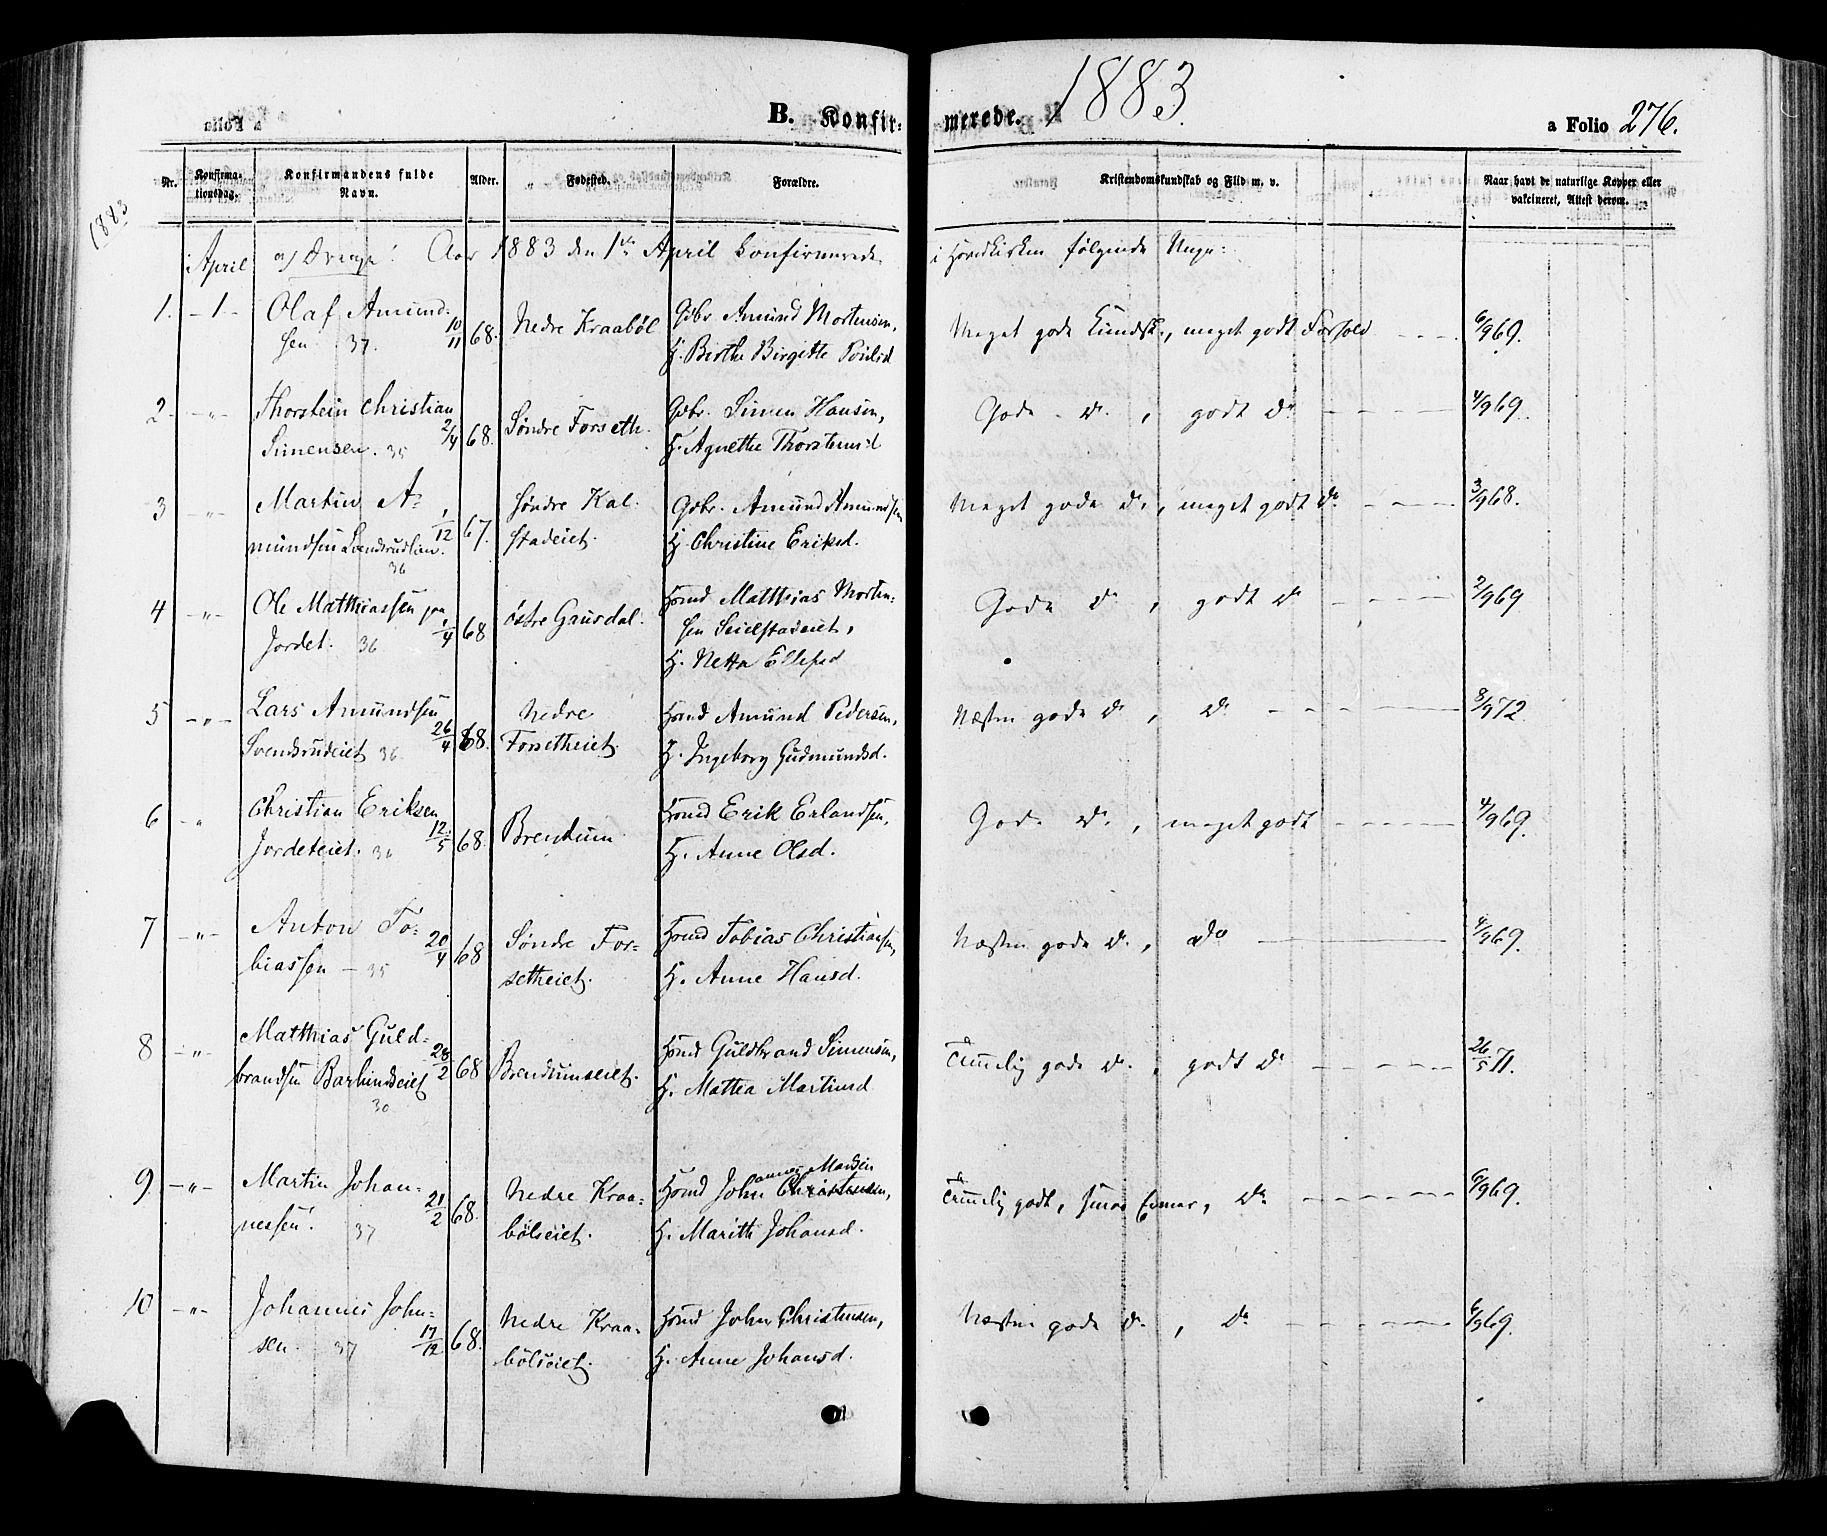 SAH, Gausdal prestekontor, Ministerialbok nr. 10, 1867-1886, s. 276